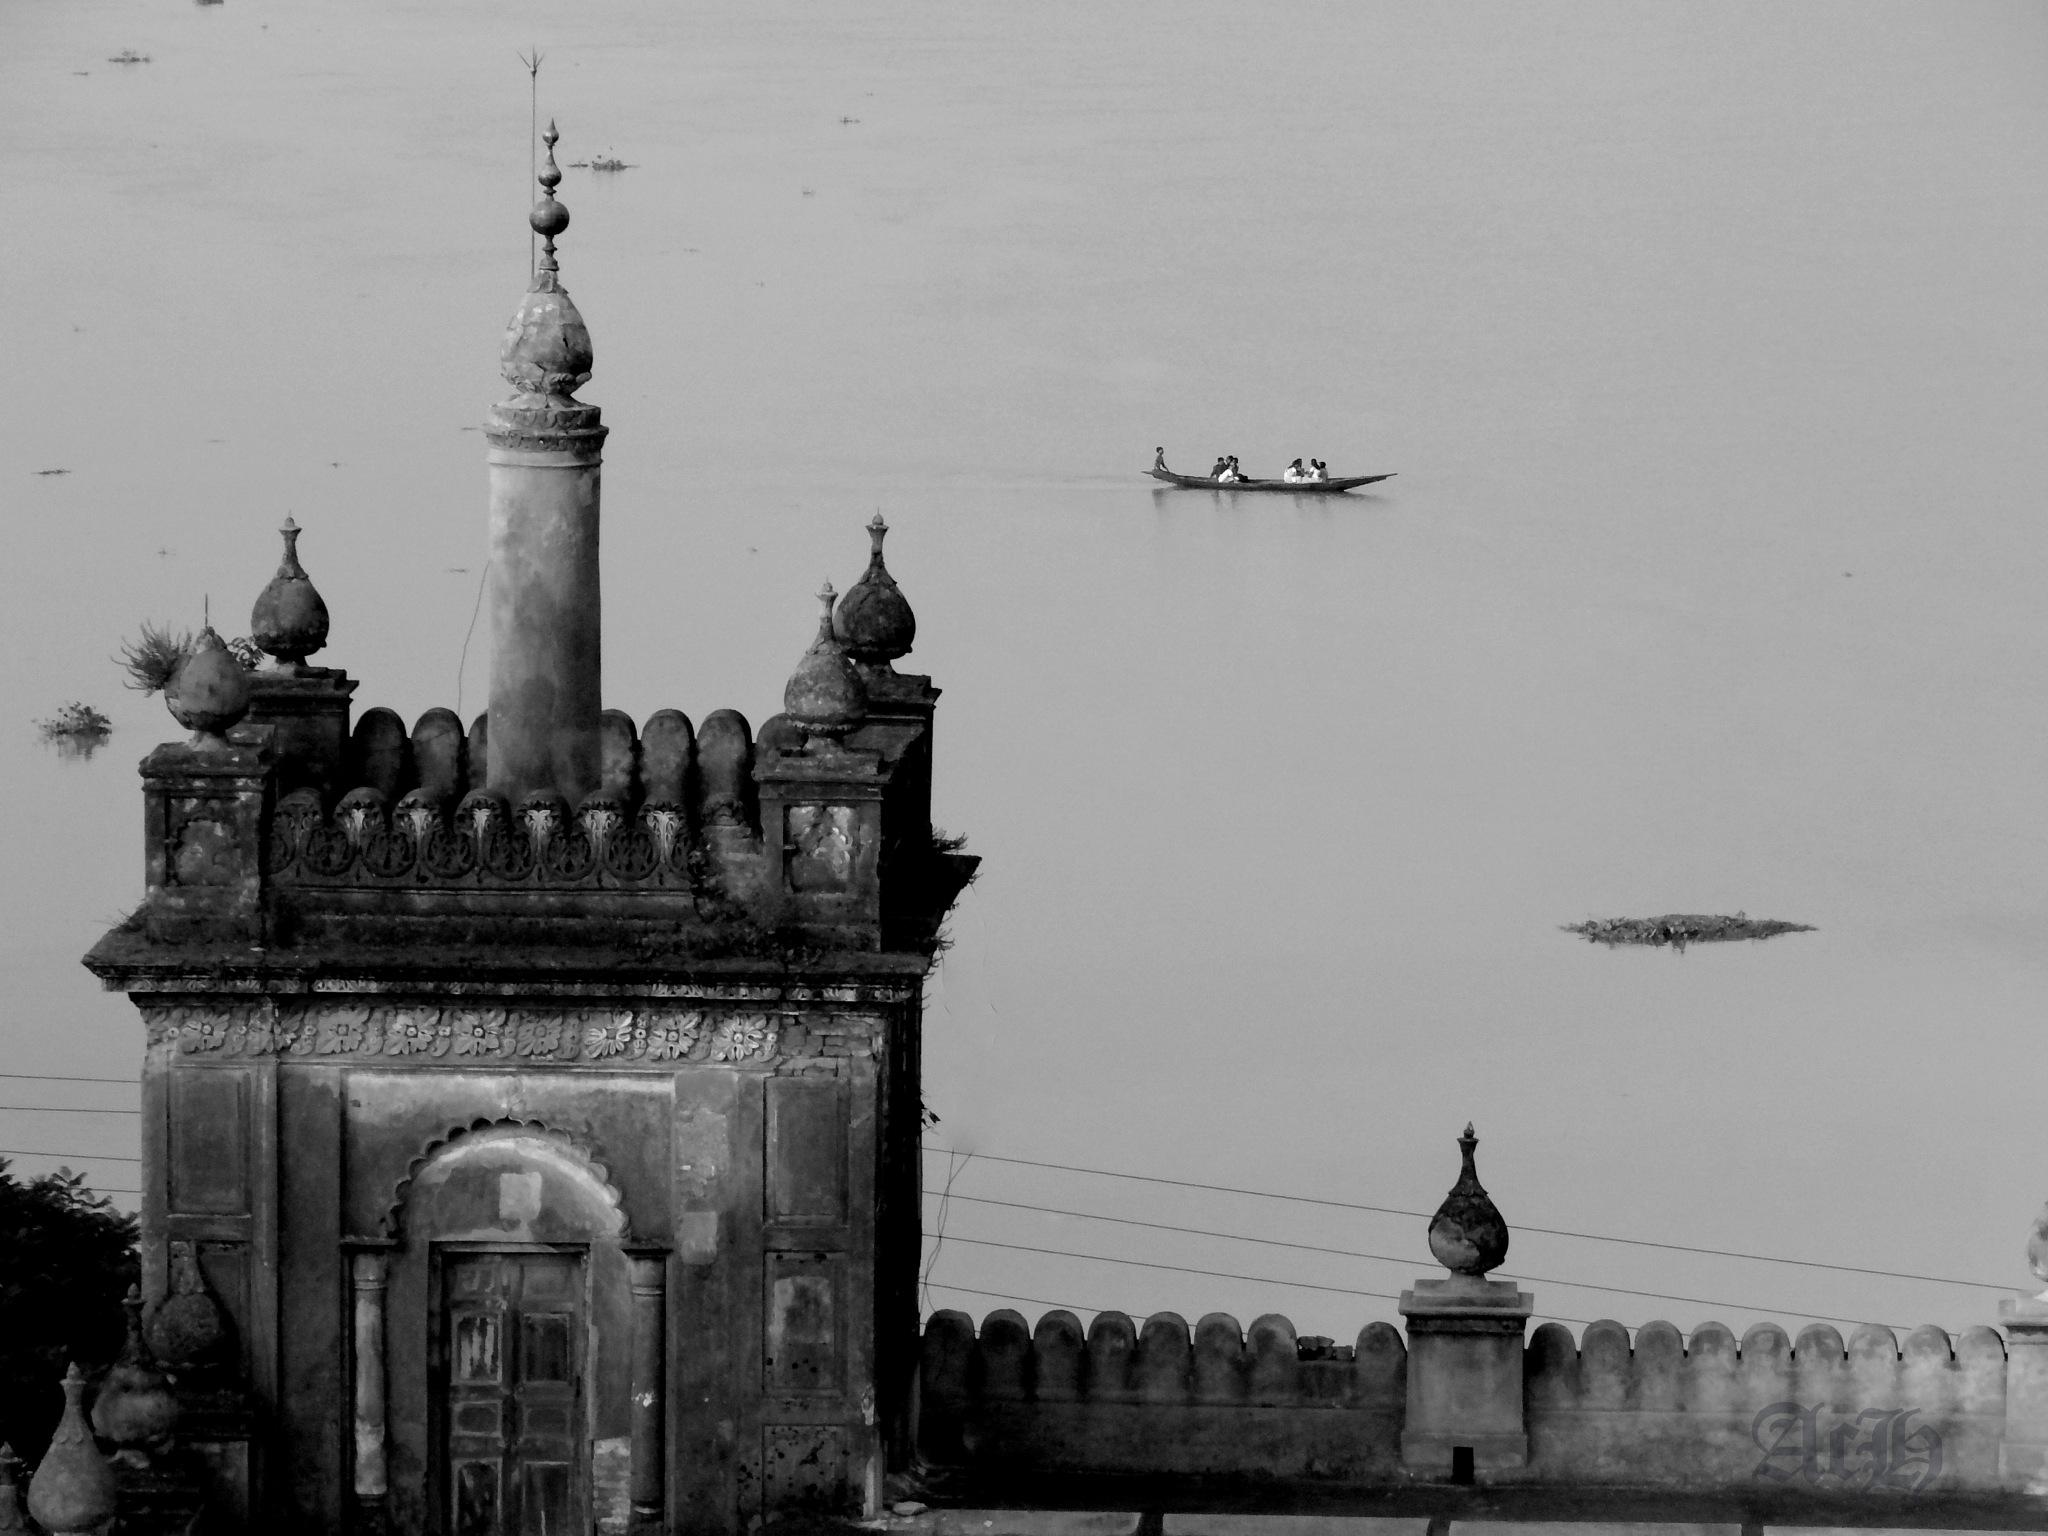 The Hooghly Imambara by Anjana CH